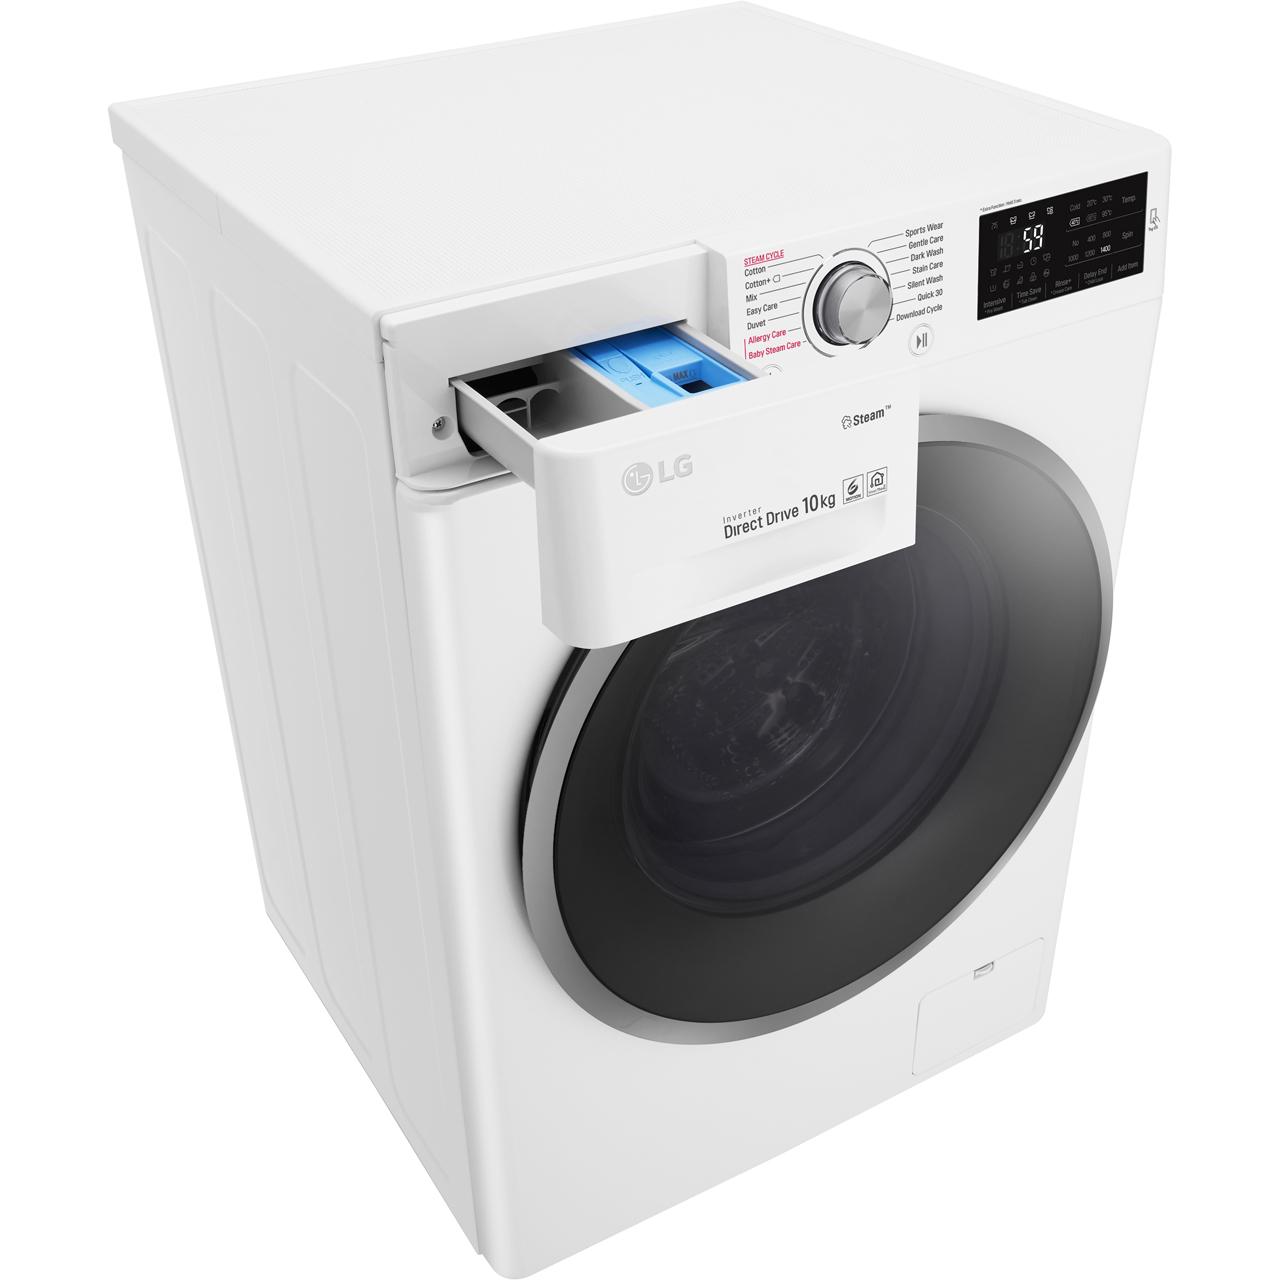 LG Steam™ F4J6JY1W Washing Machine - White